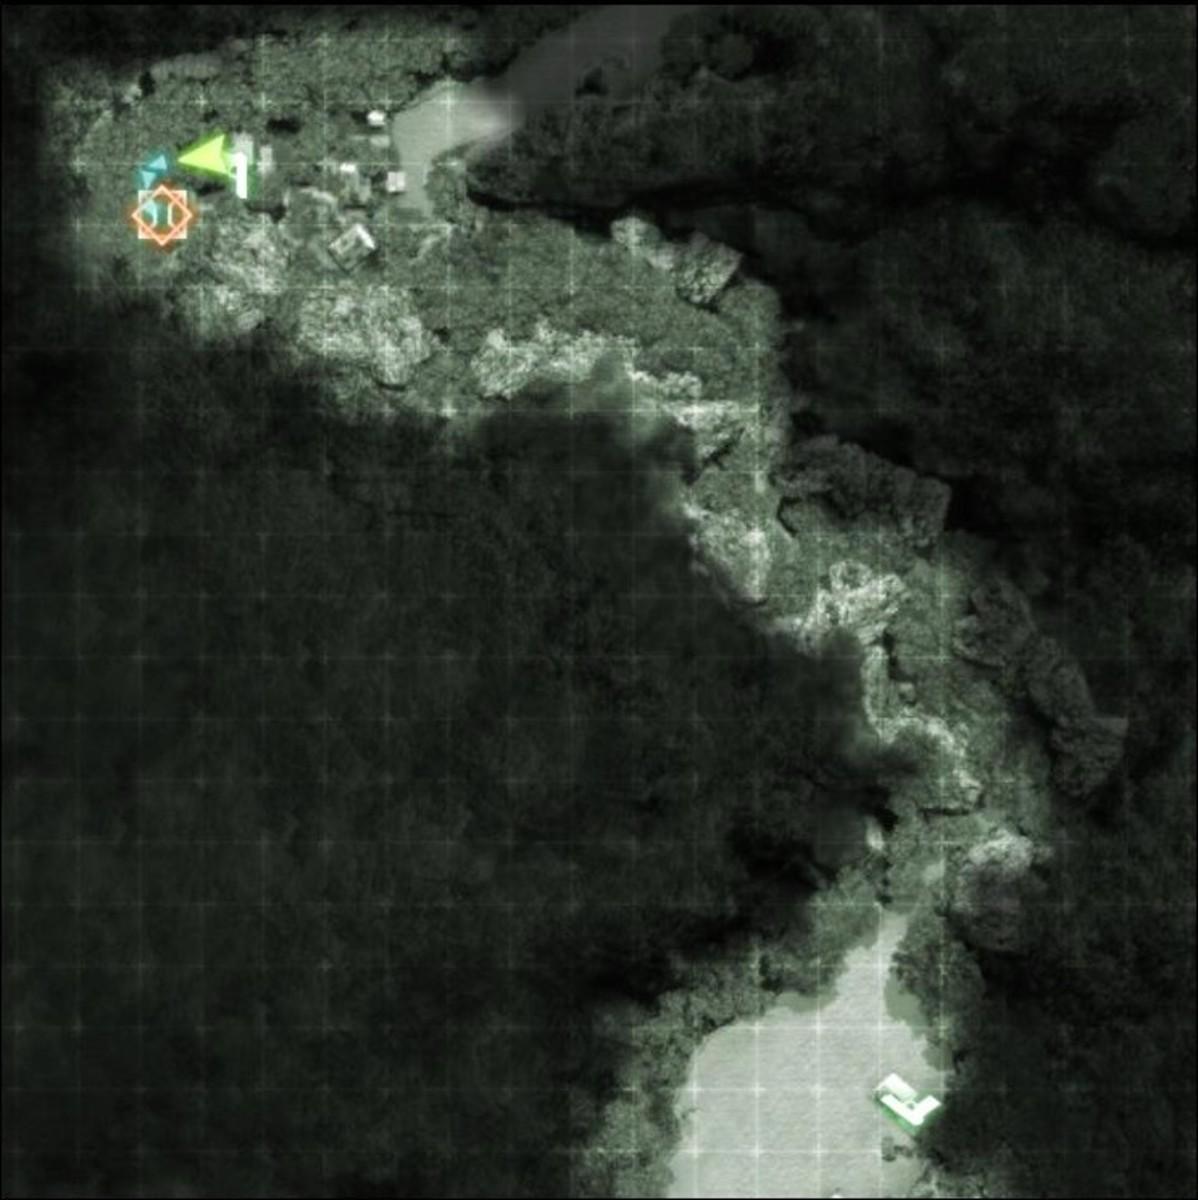 Gameplay: Heart of Darkness M-COM / Satellite Uplink 01.